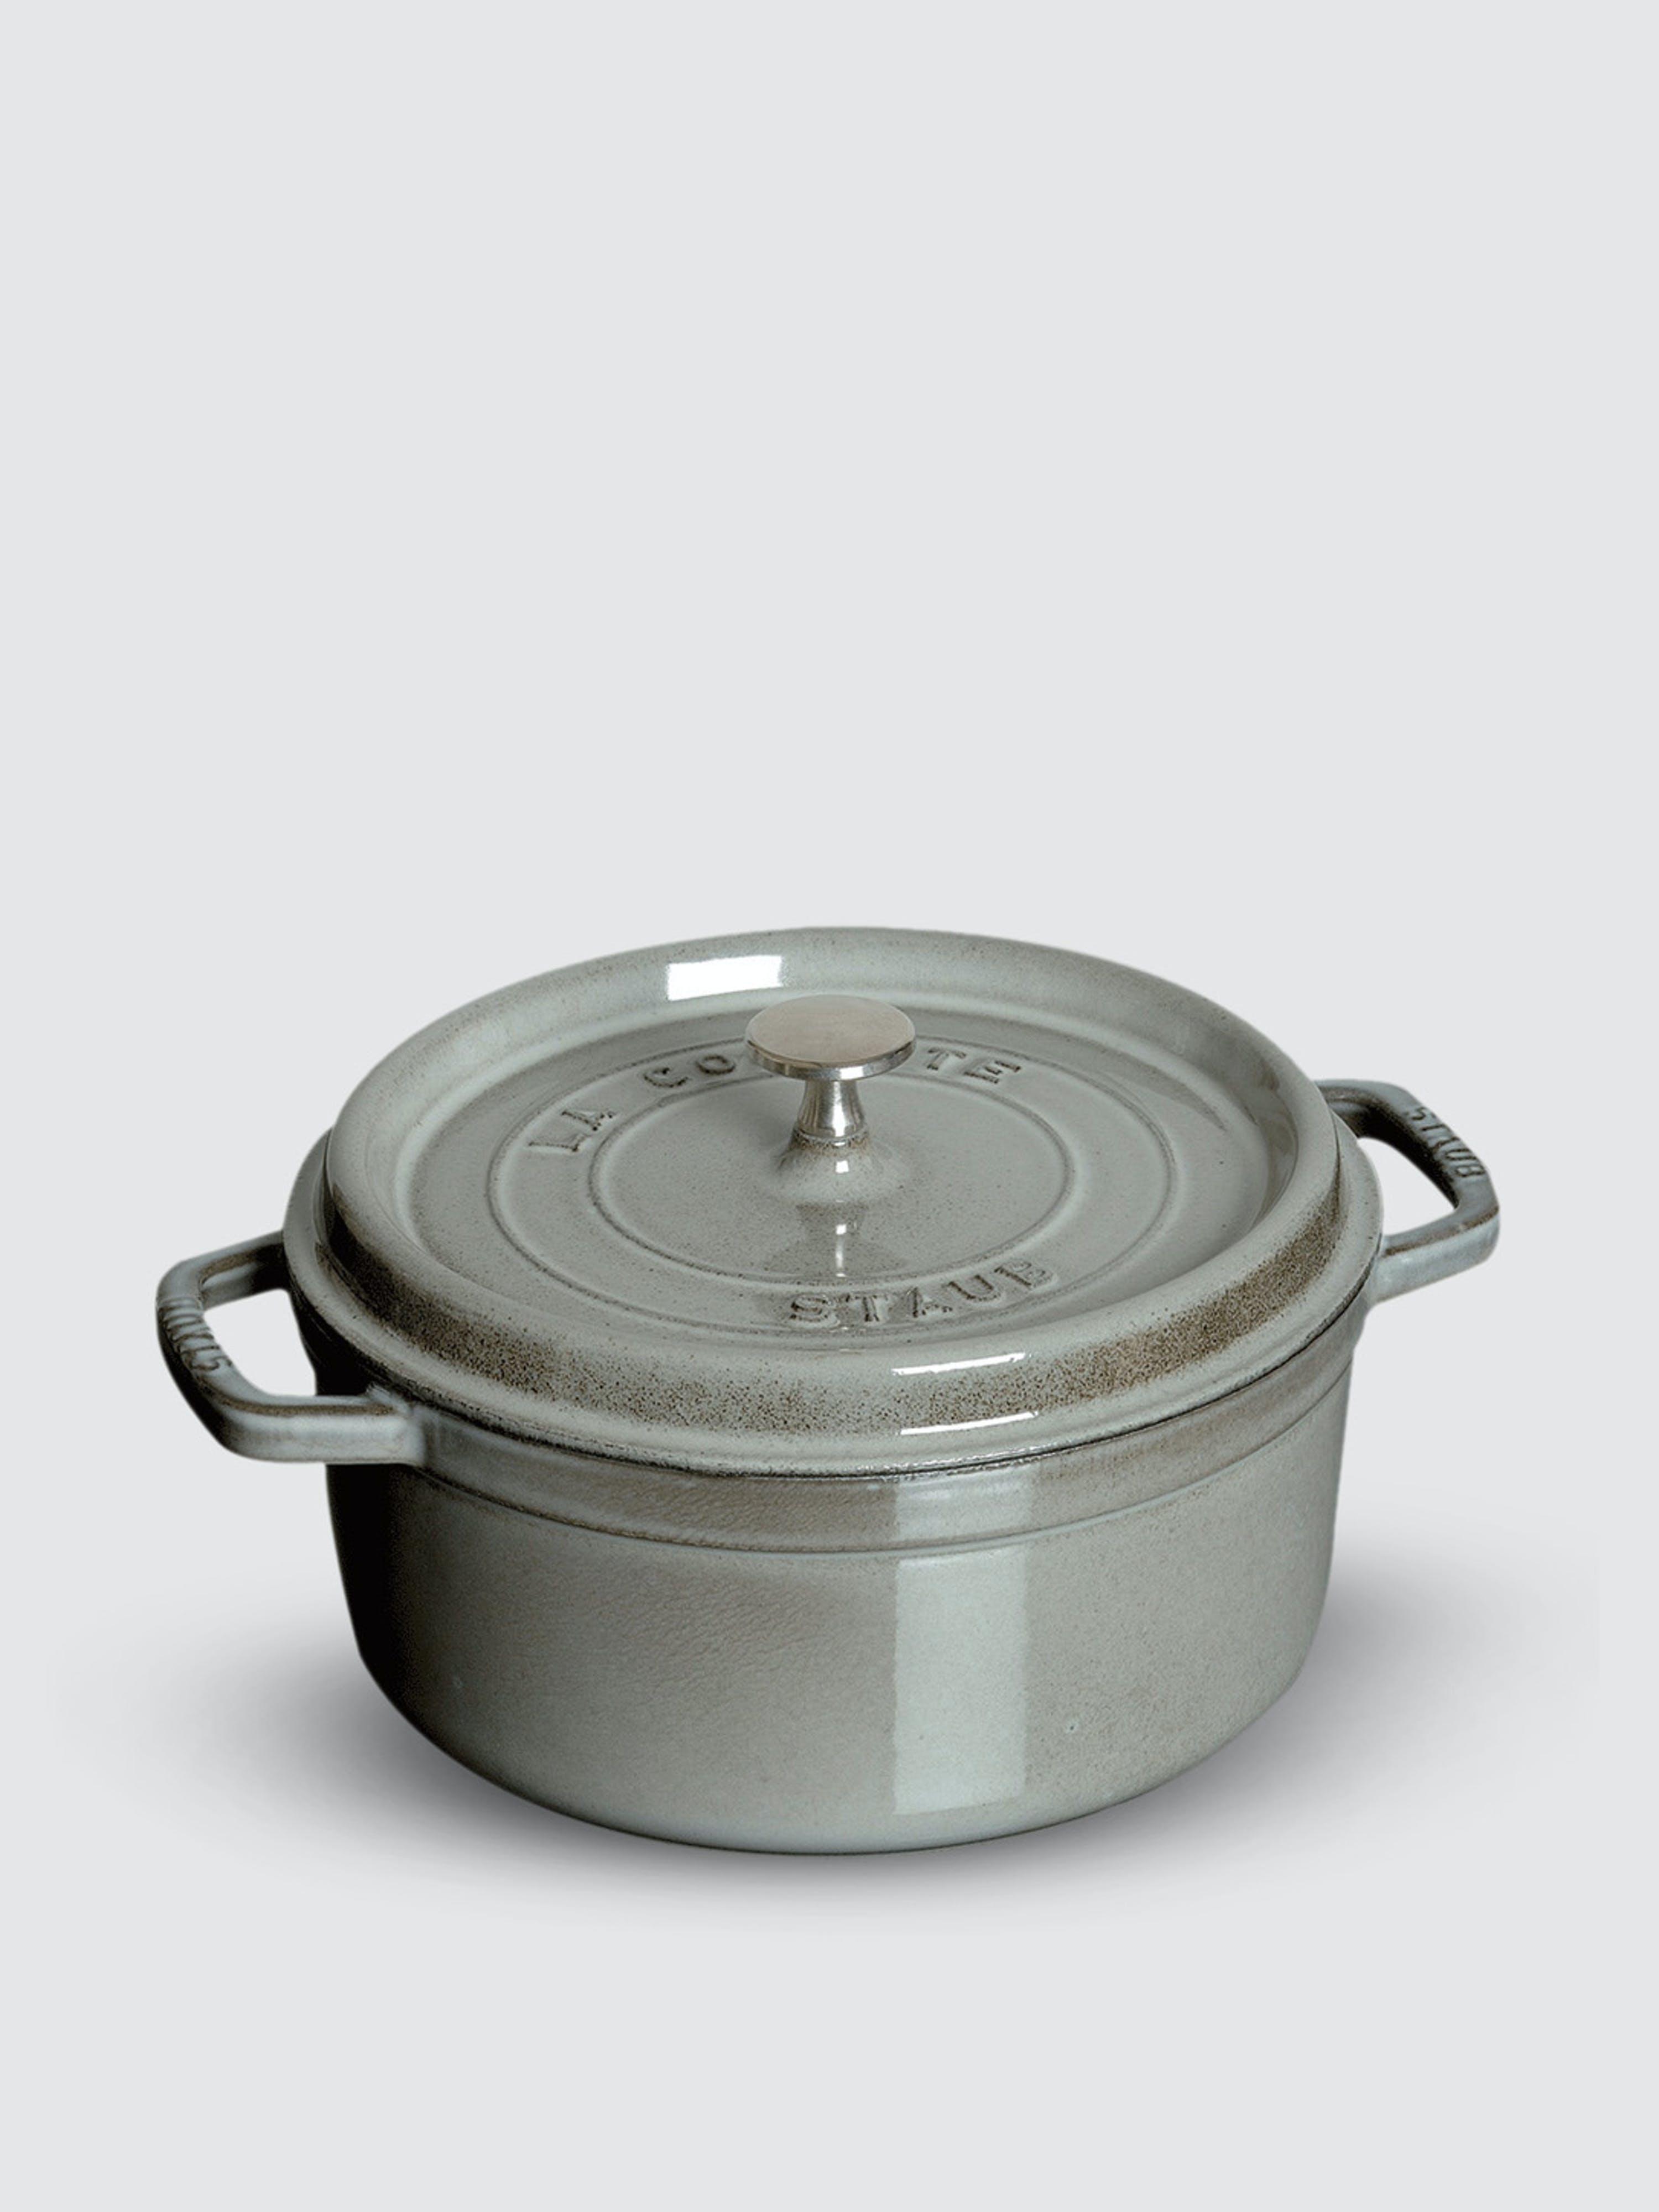 Staub - Verified Partner 2.75-Qt Round Cocotte  - Grey